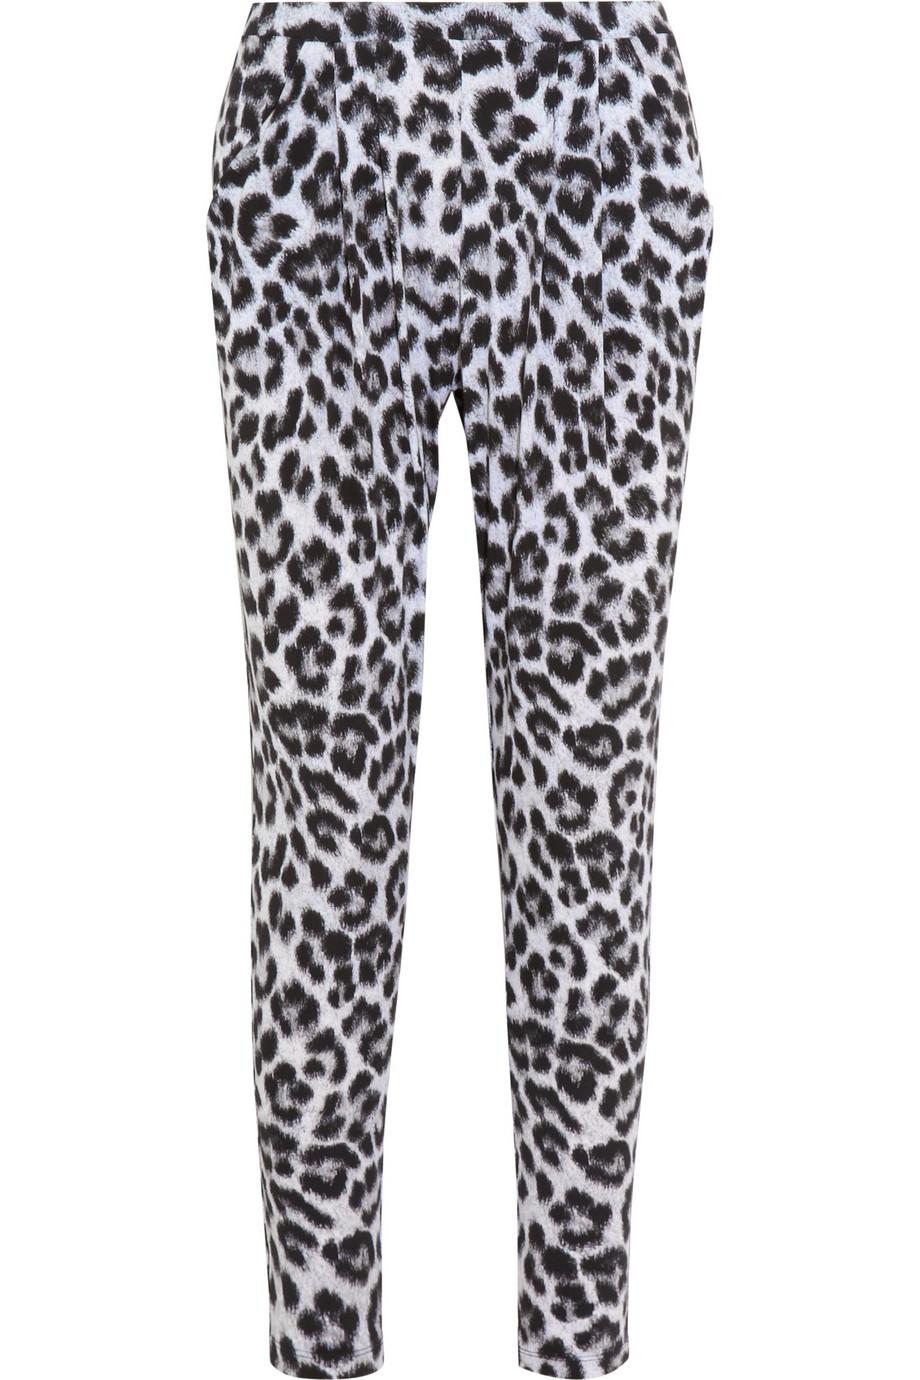 Lyst Michael Michael Kors Tunisia Cheetahprint Jersey Pants